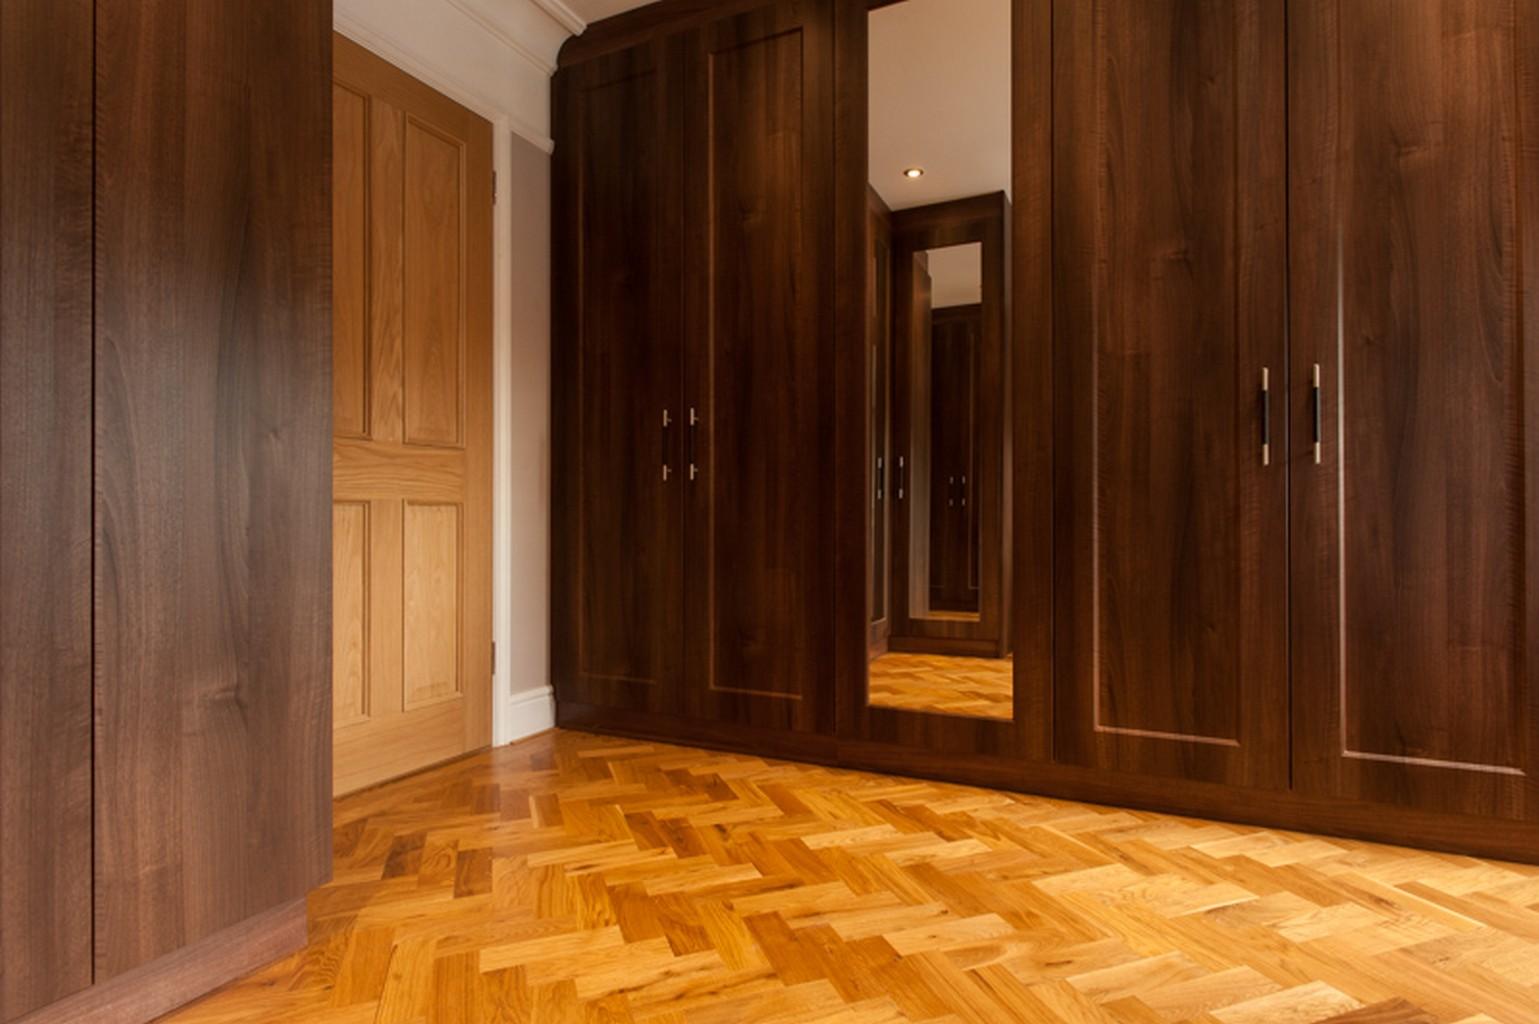 herringbone luxury wood flooring and wooden closets